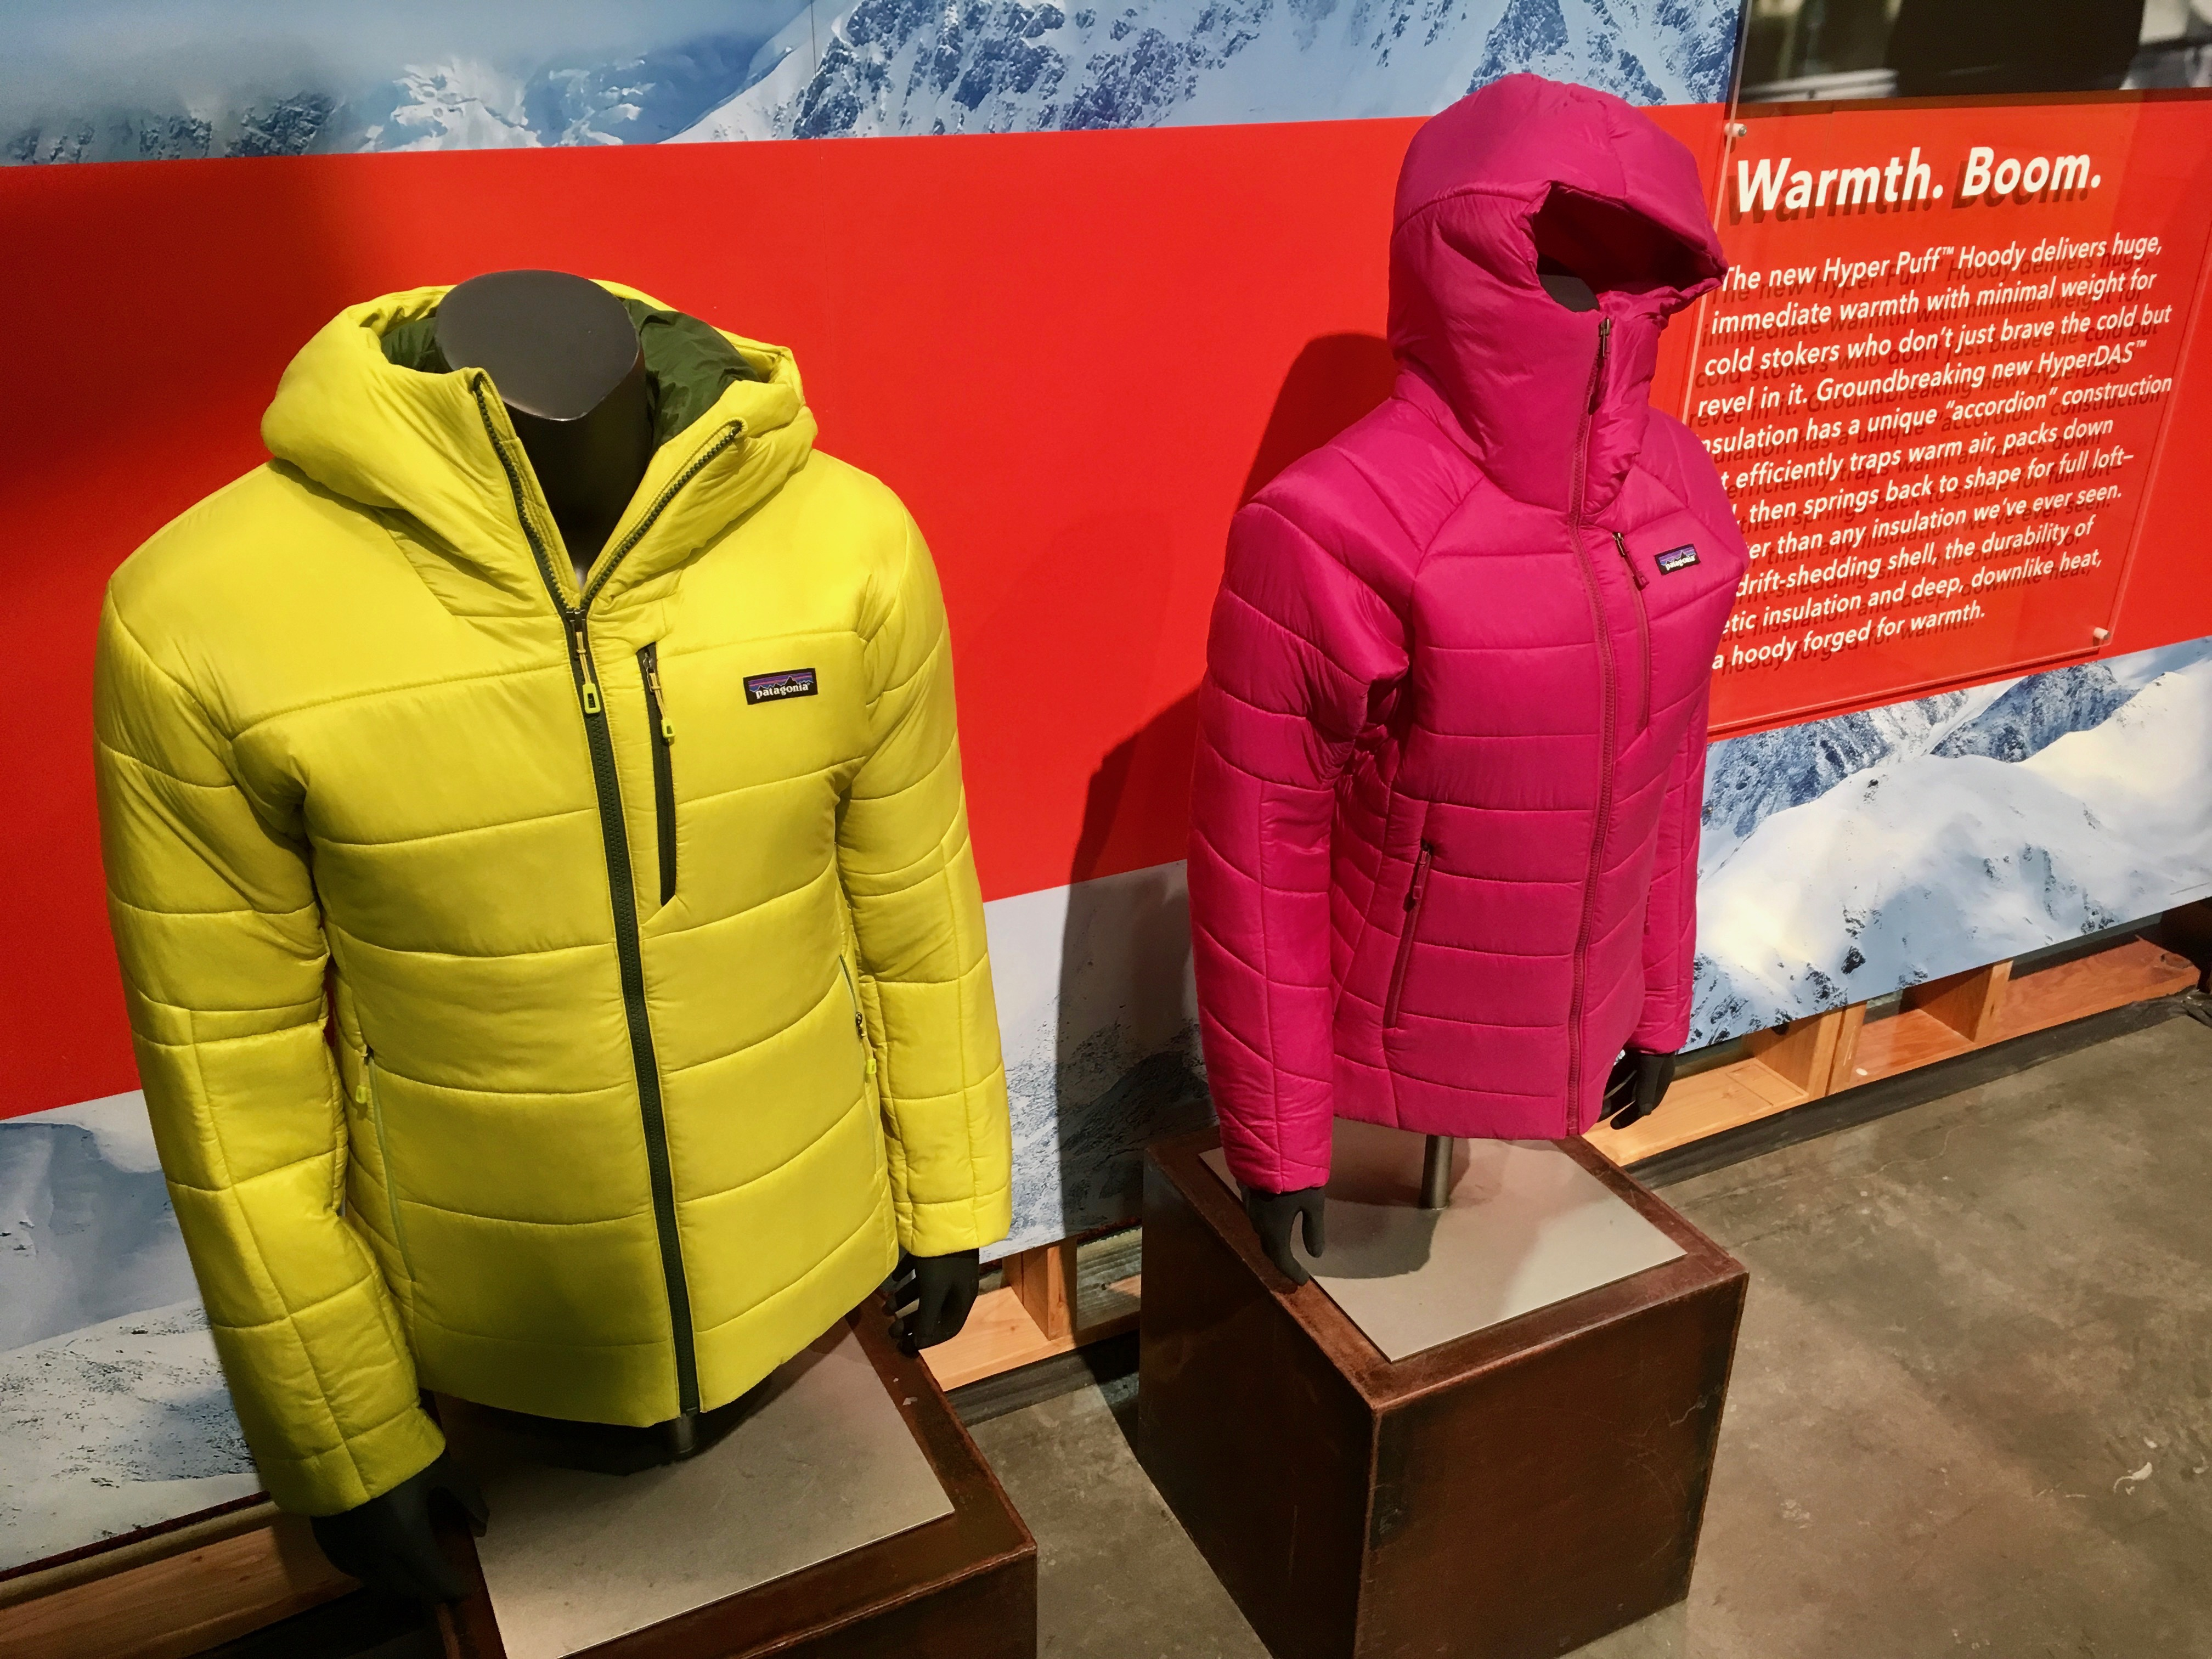 cb888d105 2017 Winter Outdoor Retailer - Seek Outside